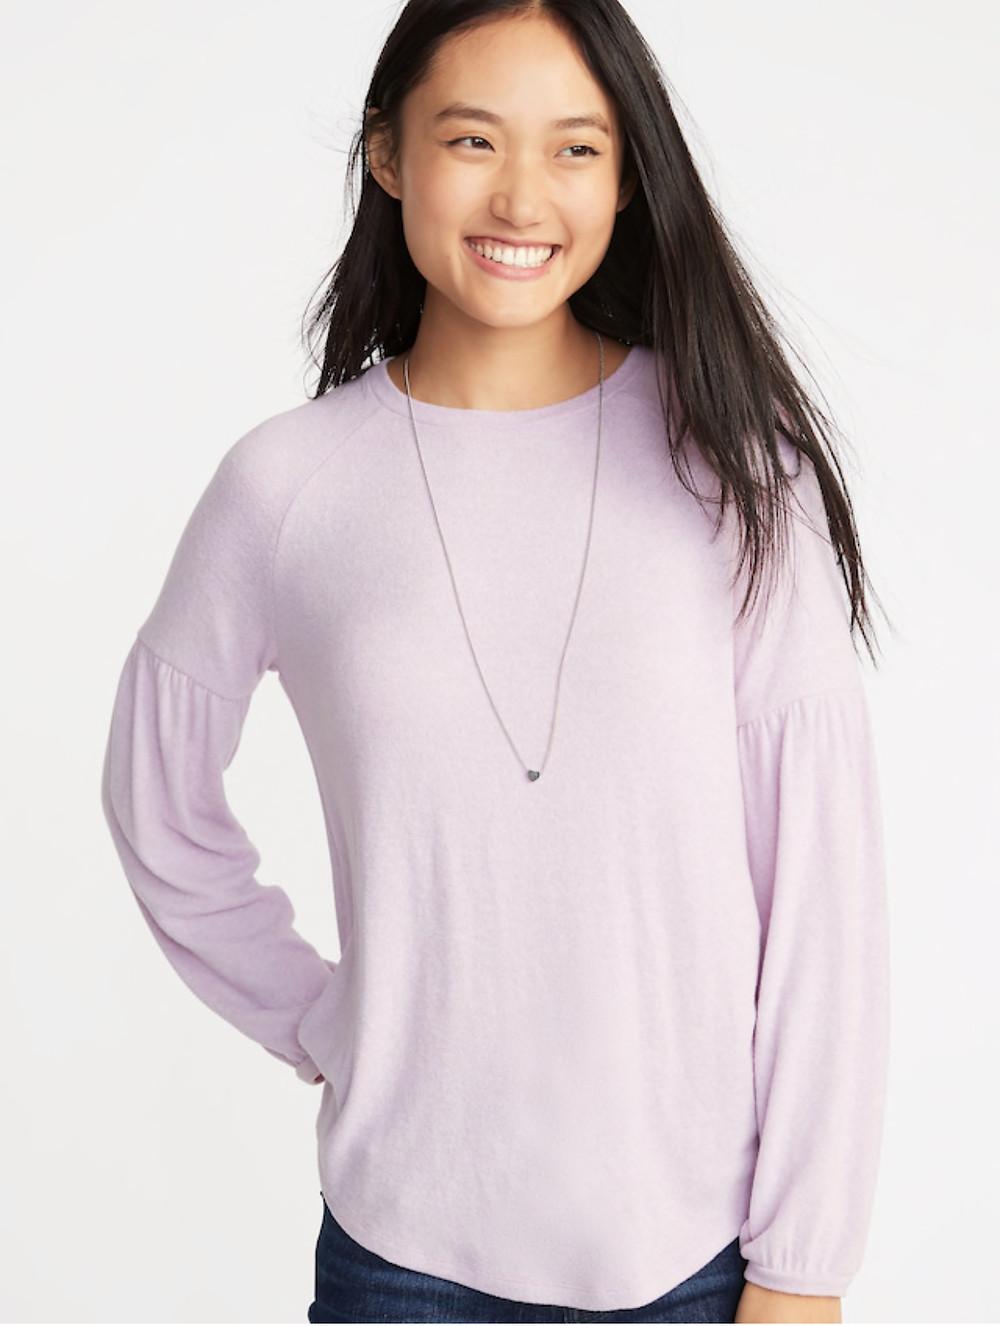 Plush Knit Balloon Sleeve Top for Women